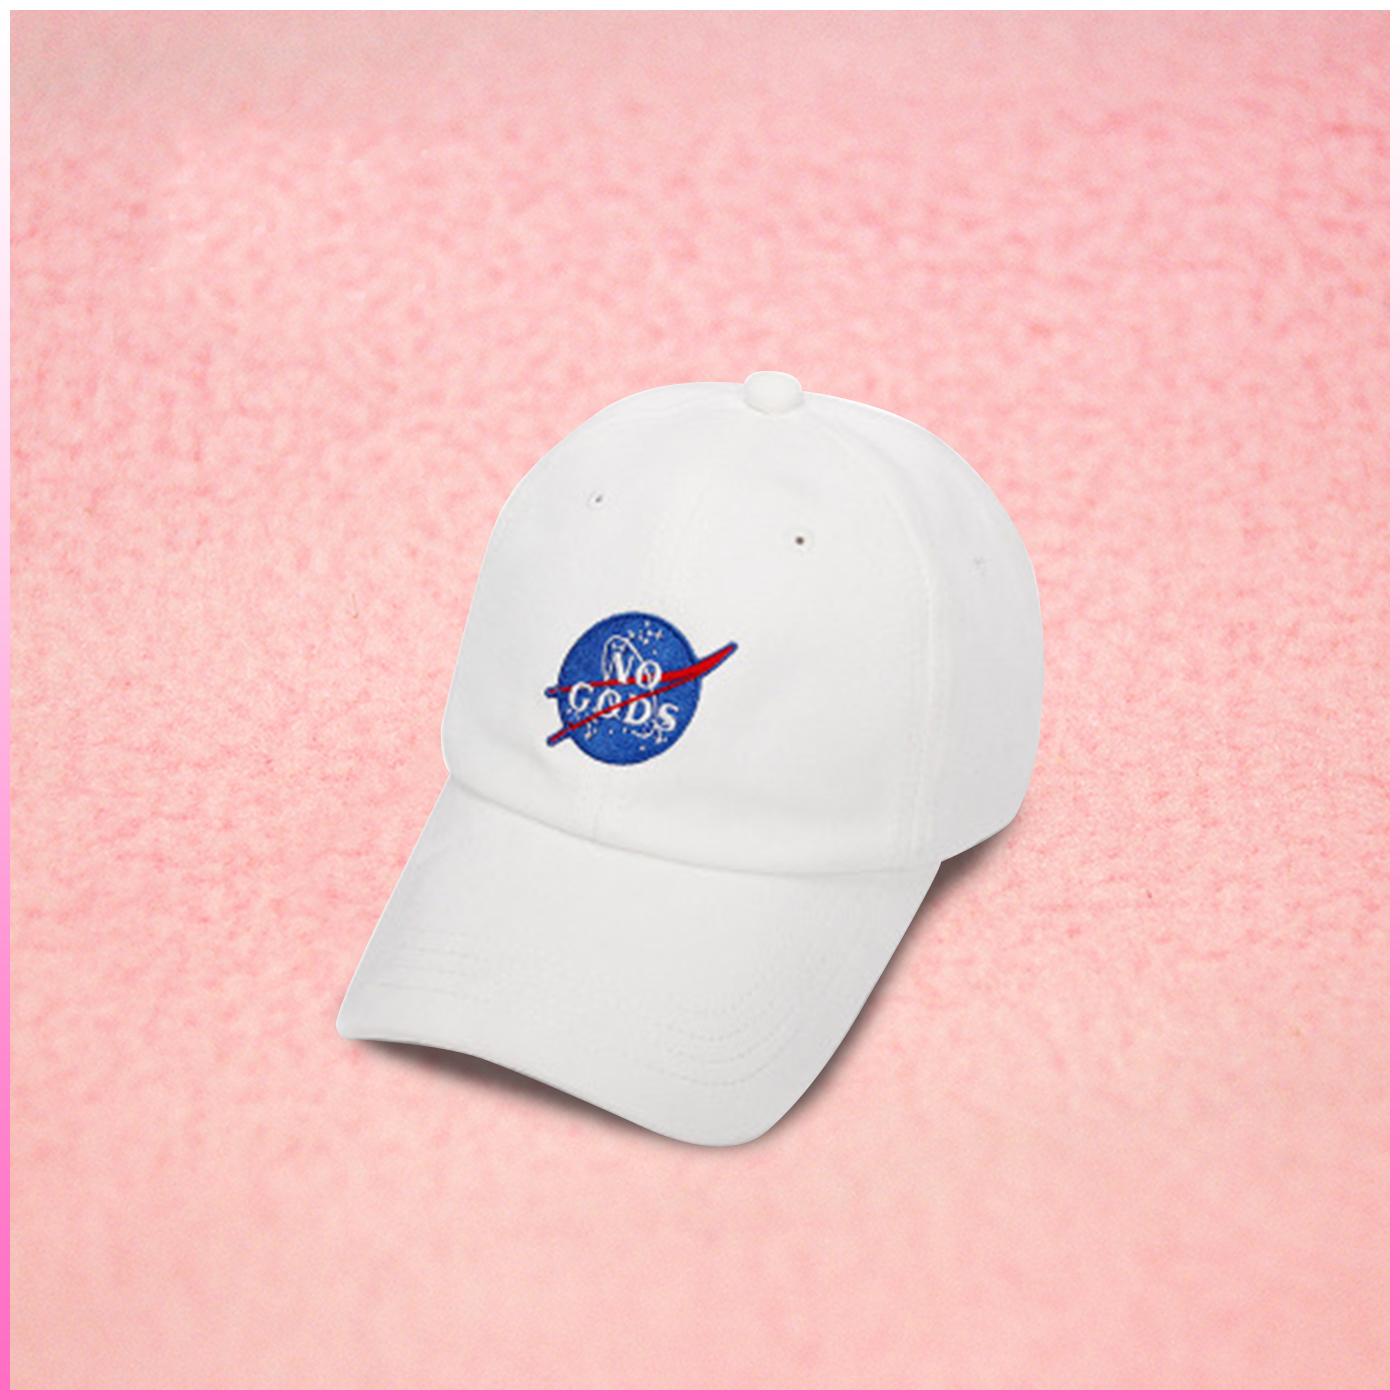 0fae42857cf31 NASA SPOOF NO GOD BASEBALL CAP IN WHITE on Storenvy